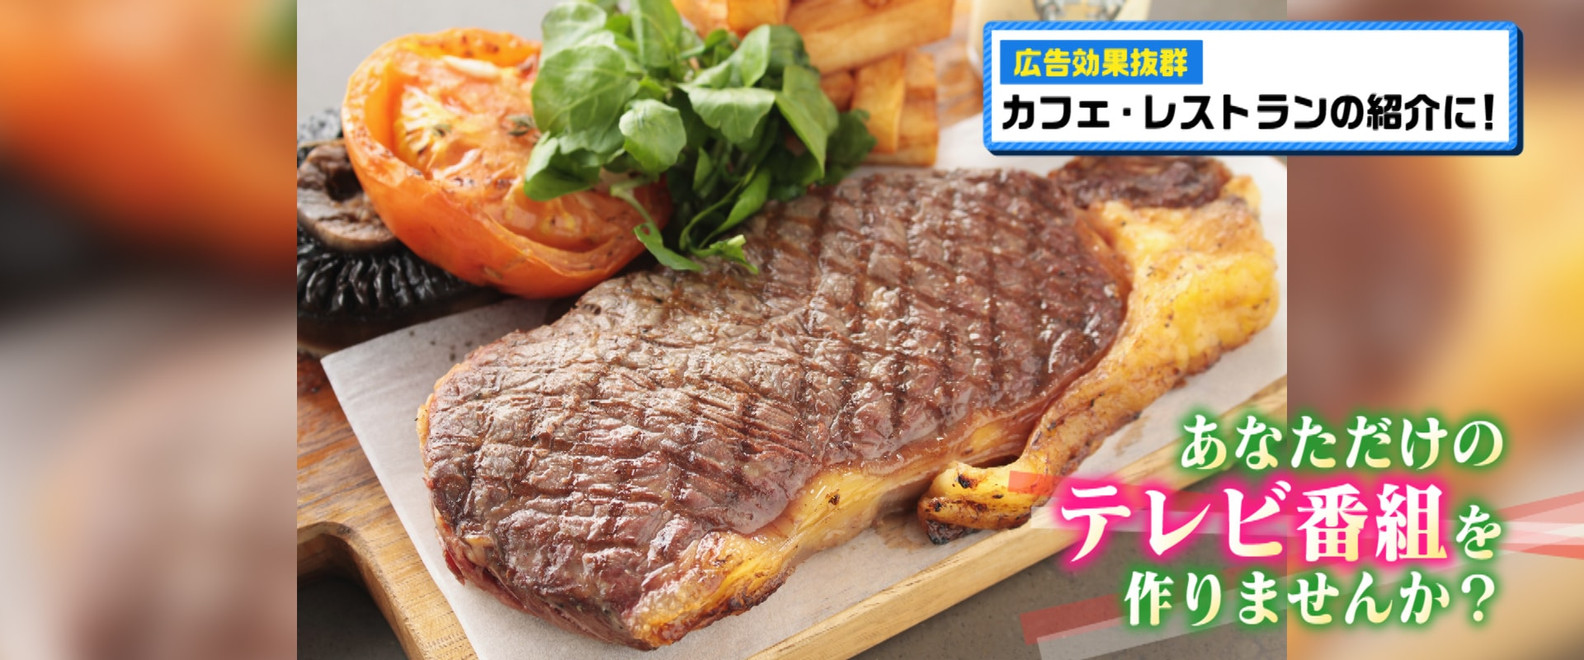 Luvas_サービス_TV (1).jpg